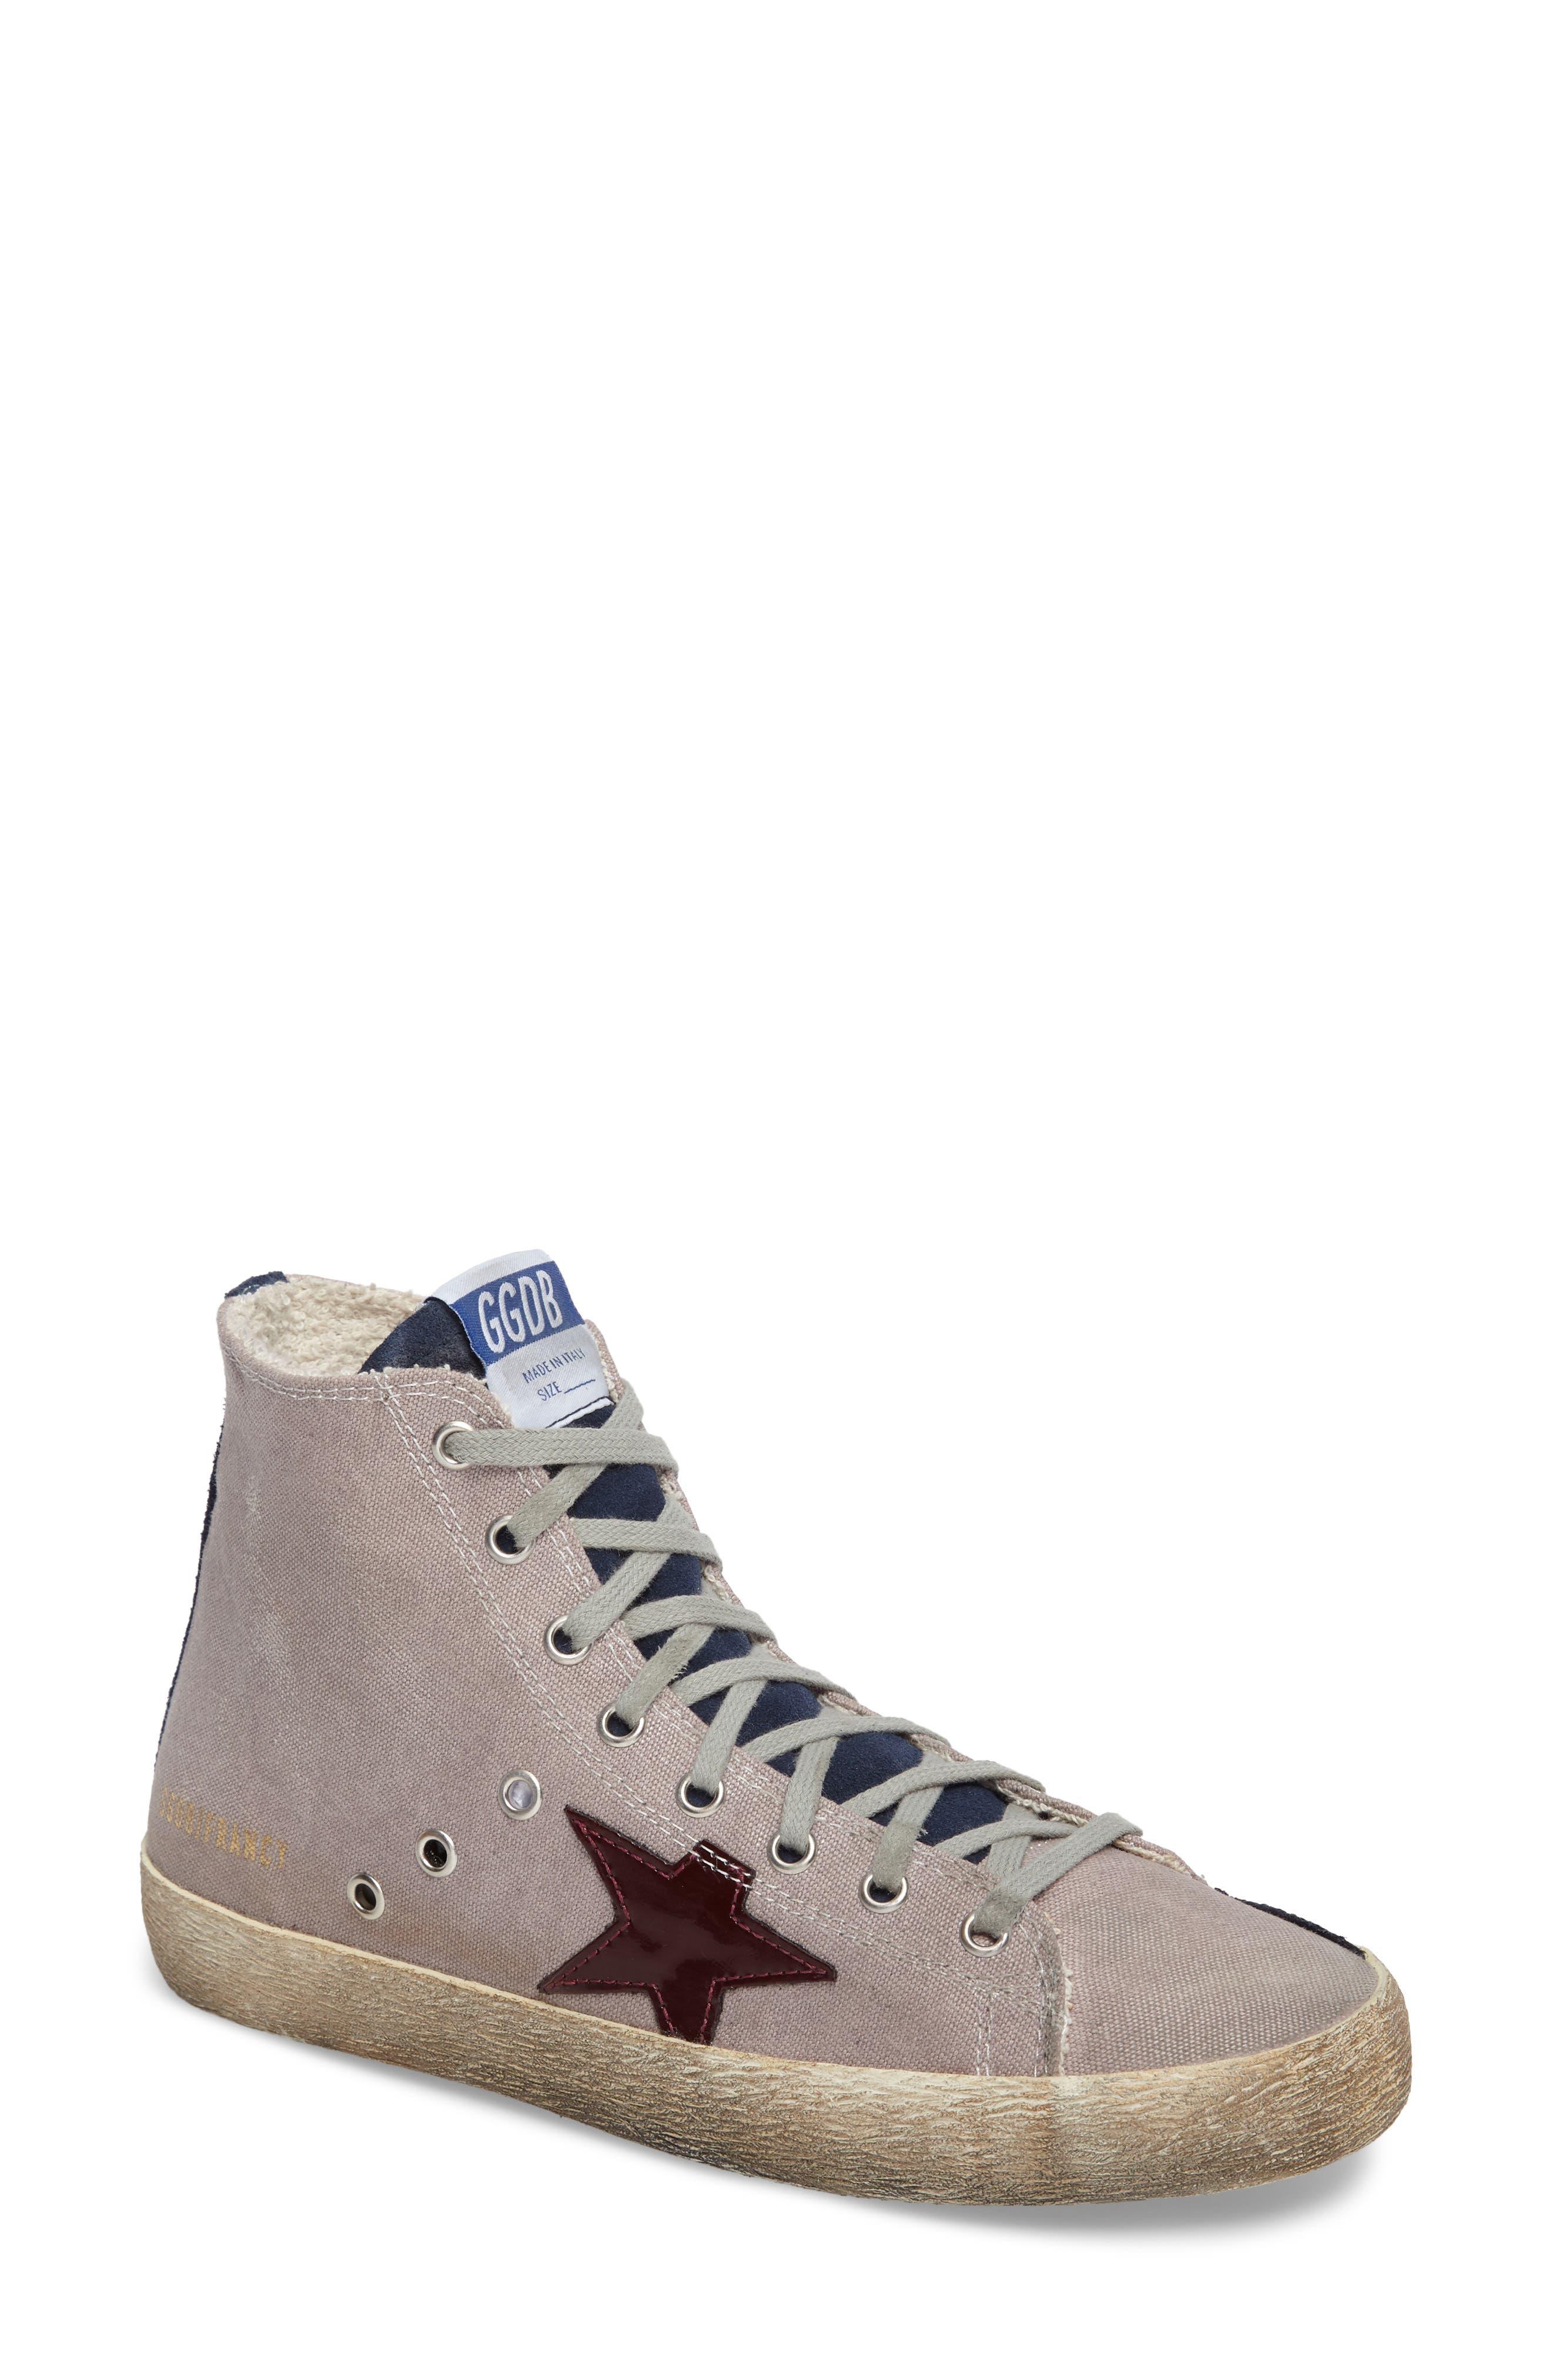 Francy Mid Top Sneaker,                             Main thumbnail 1, color,                             530